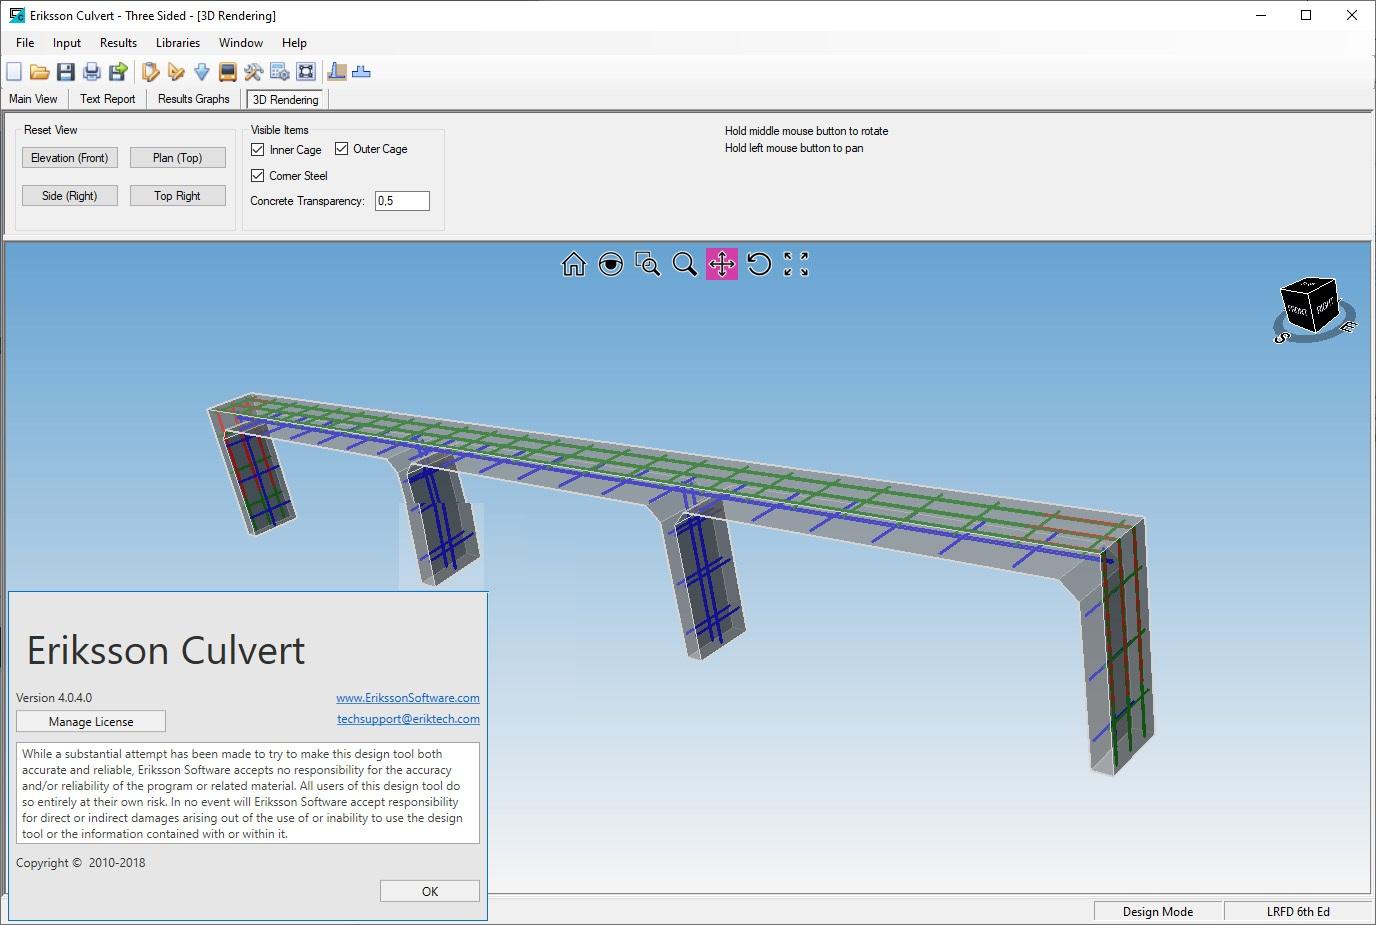 Download Eriksson Technologies Culvert v4.0.4 full license